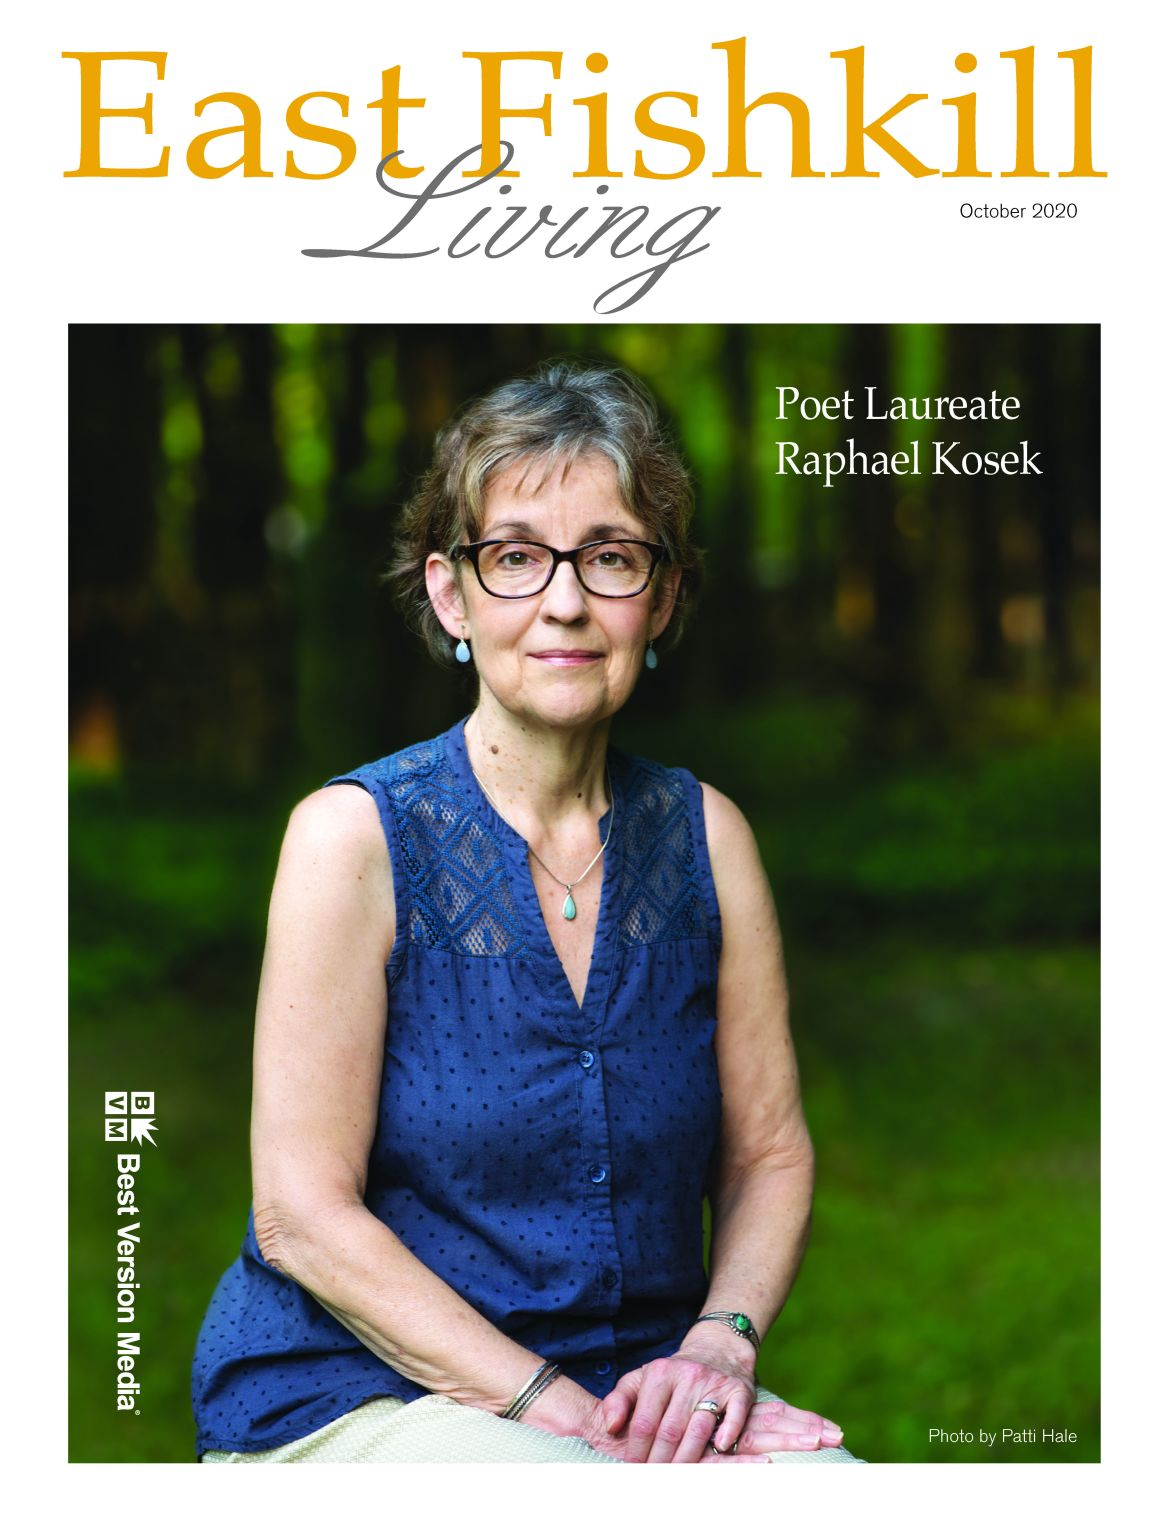 East Fishkill Living, October 2020 Cover